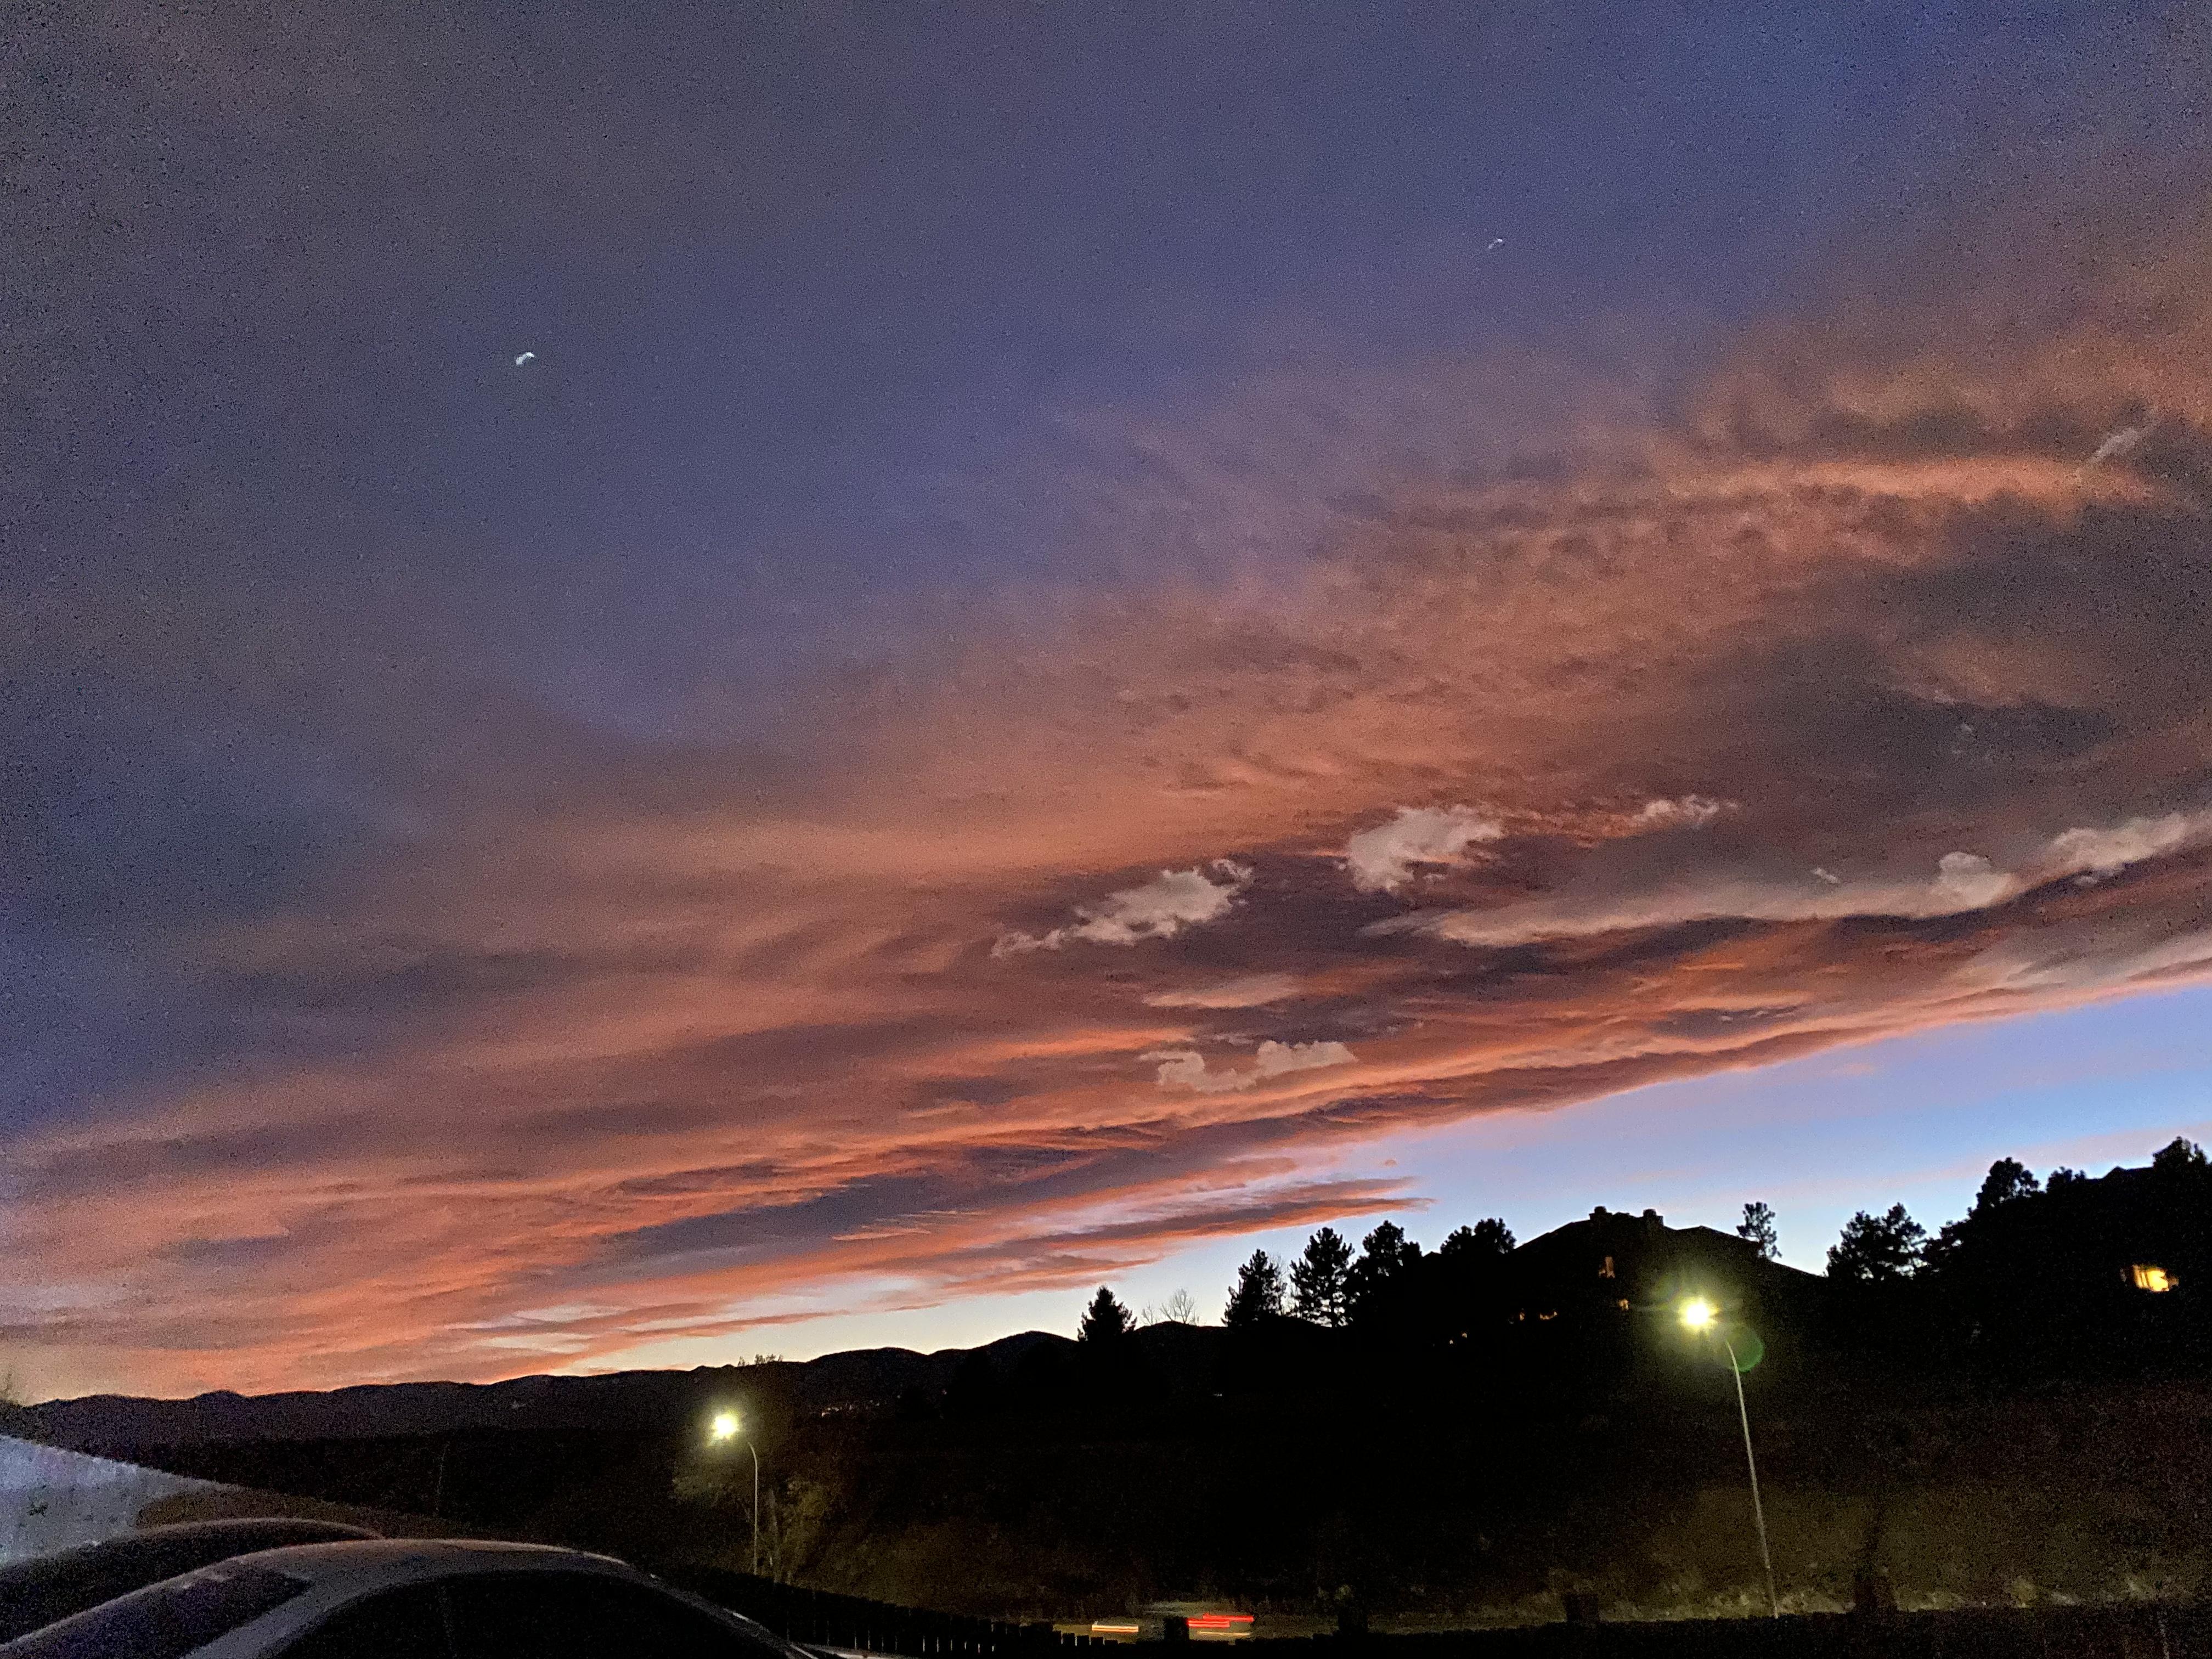 Lakewood, Colorado (United States)